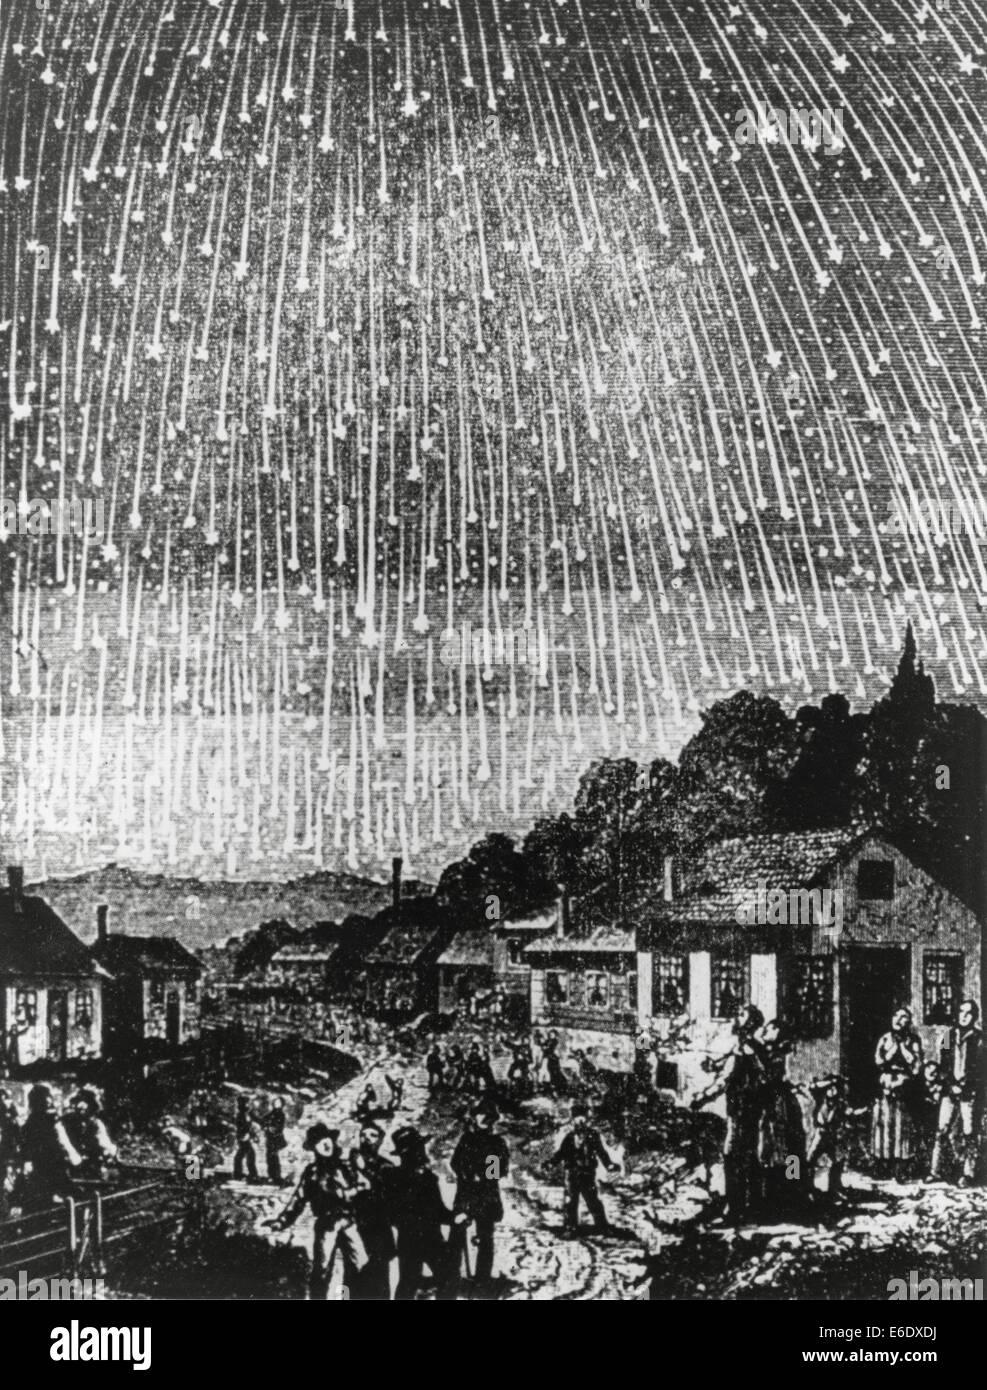 Leonid Meteor Shower of 1833, USA, Illustration